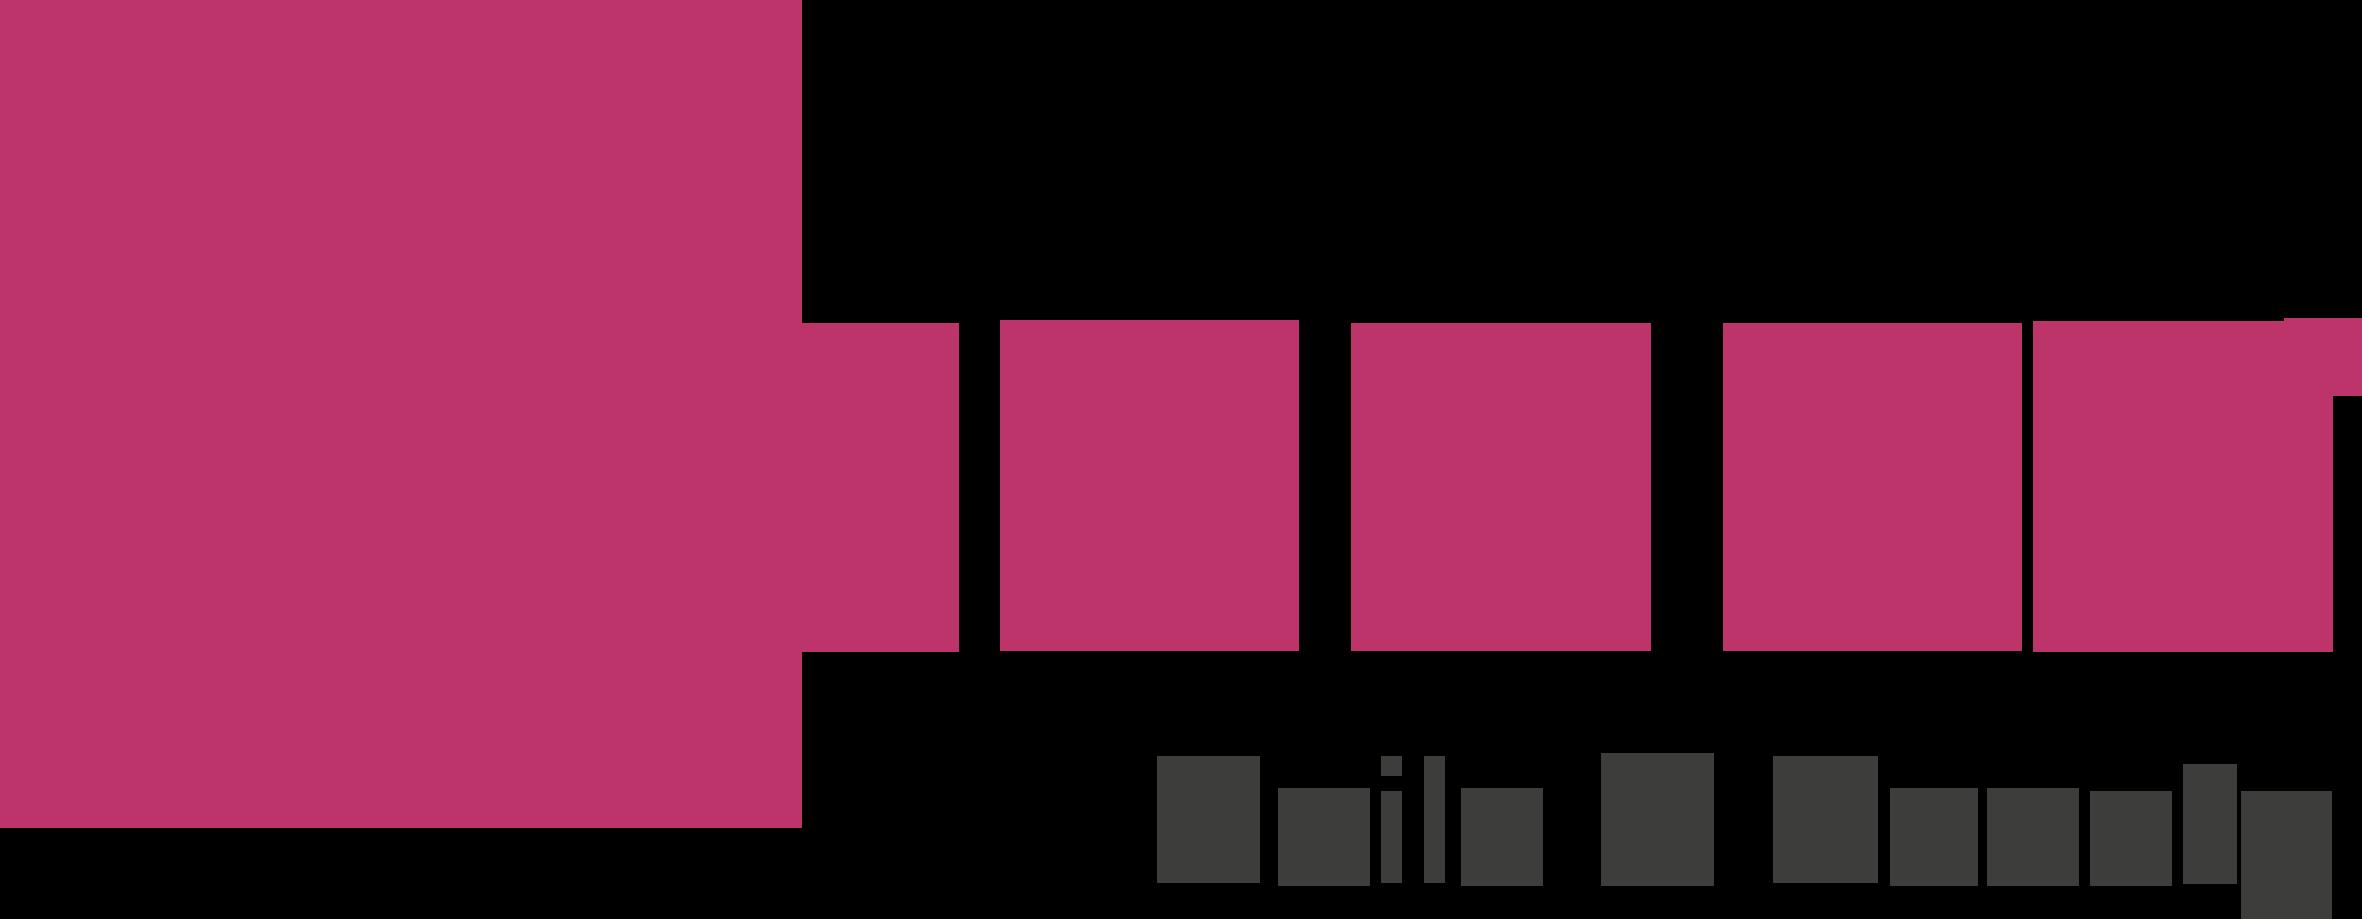 Amanda Nails & Beauty GmbH